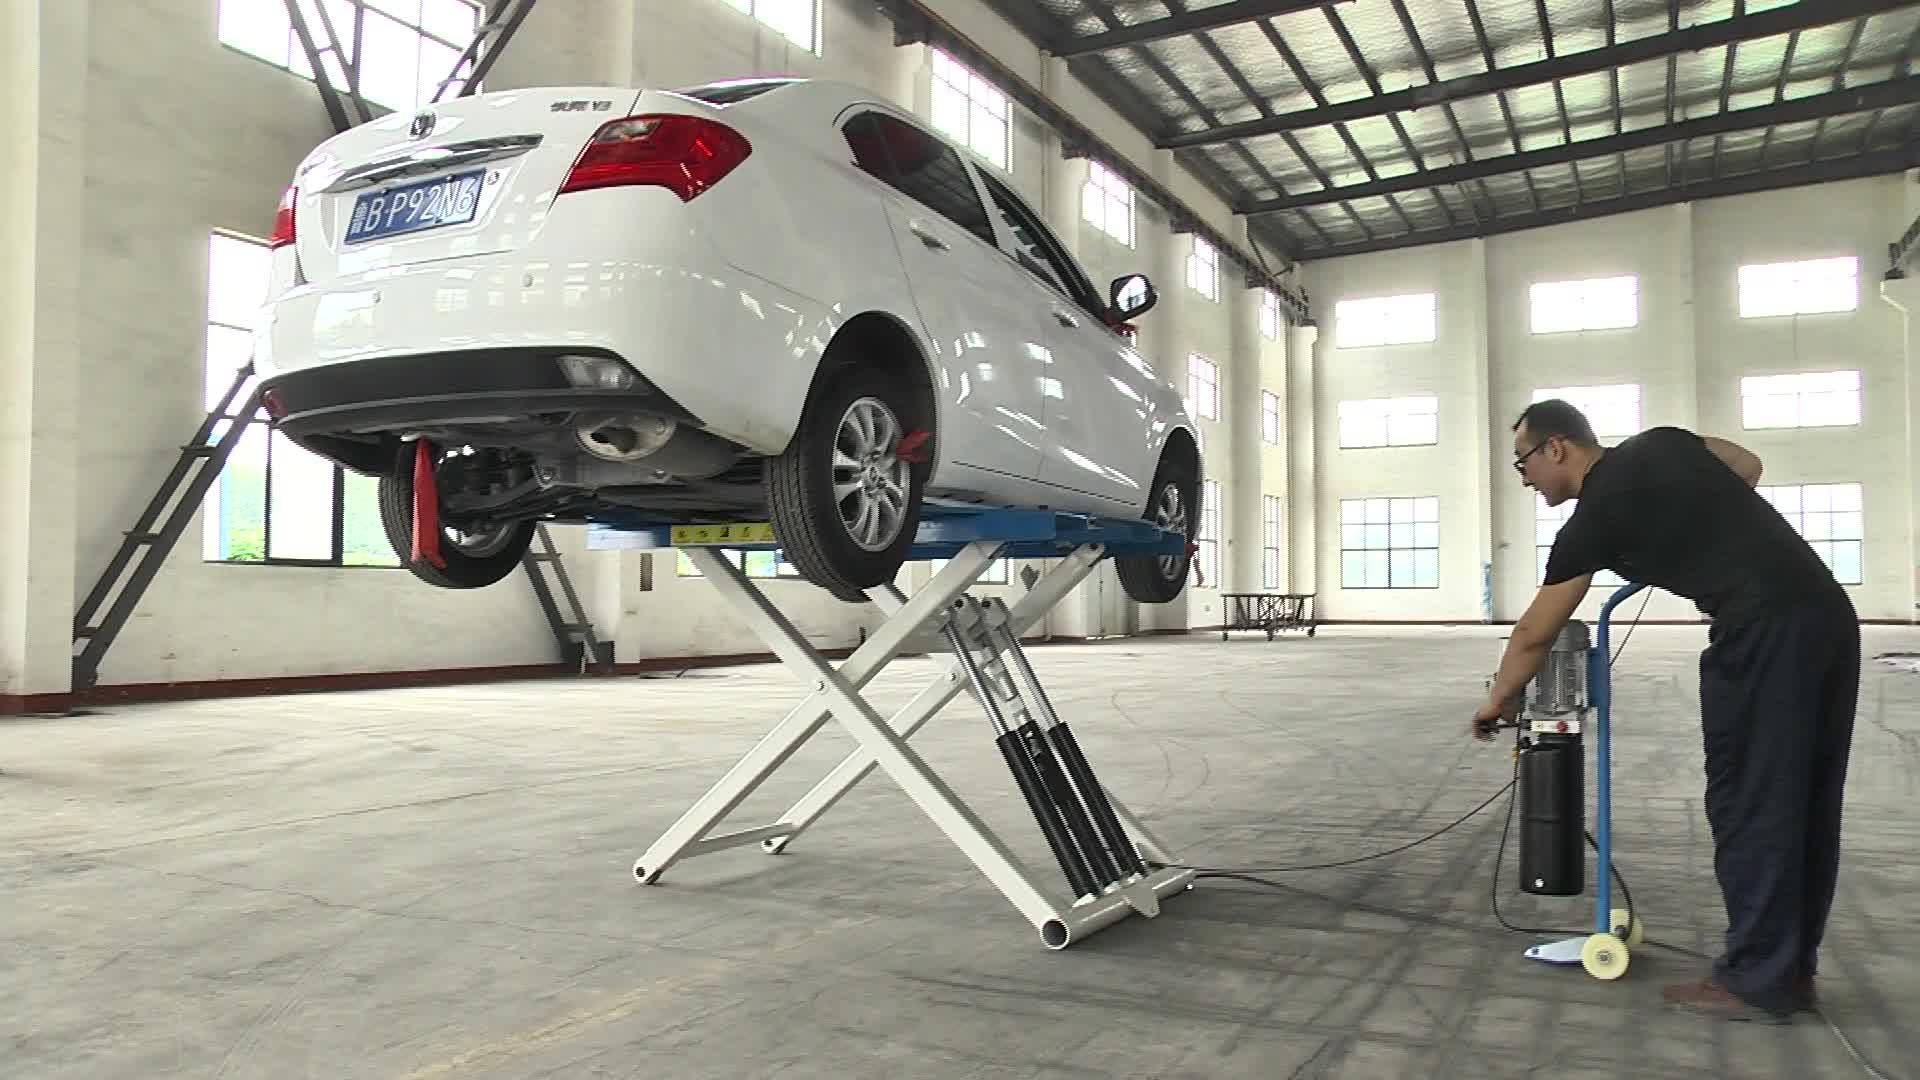 Hydraulic Portable Auto Scissor Jack Car Lift - Buy Used Hydraulic Car  Lift,Auto Scissor Car Lift,Hydraulic Jack High Lift Product on Alibaba com